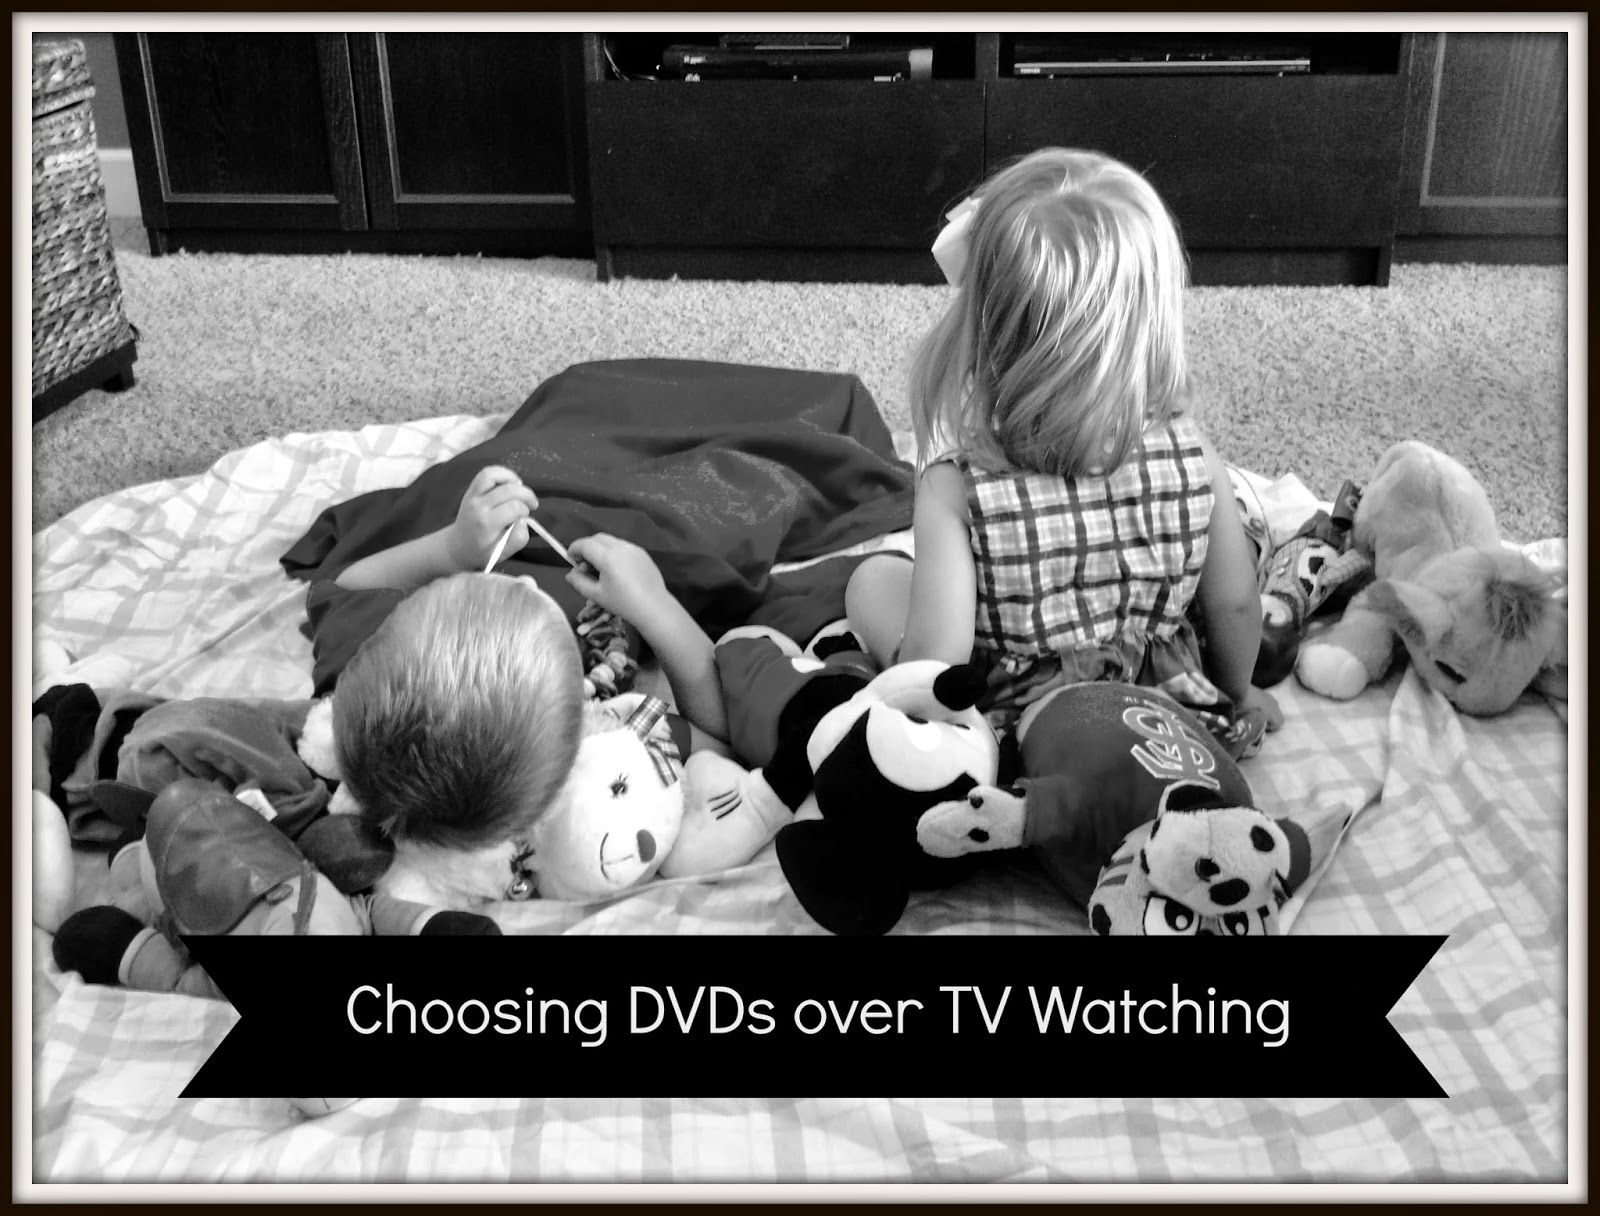 DVDS over TV